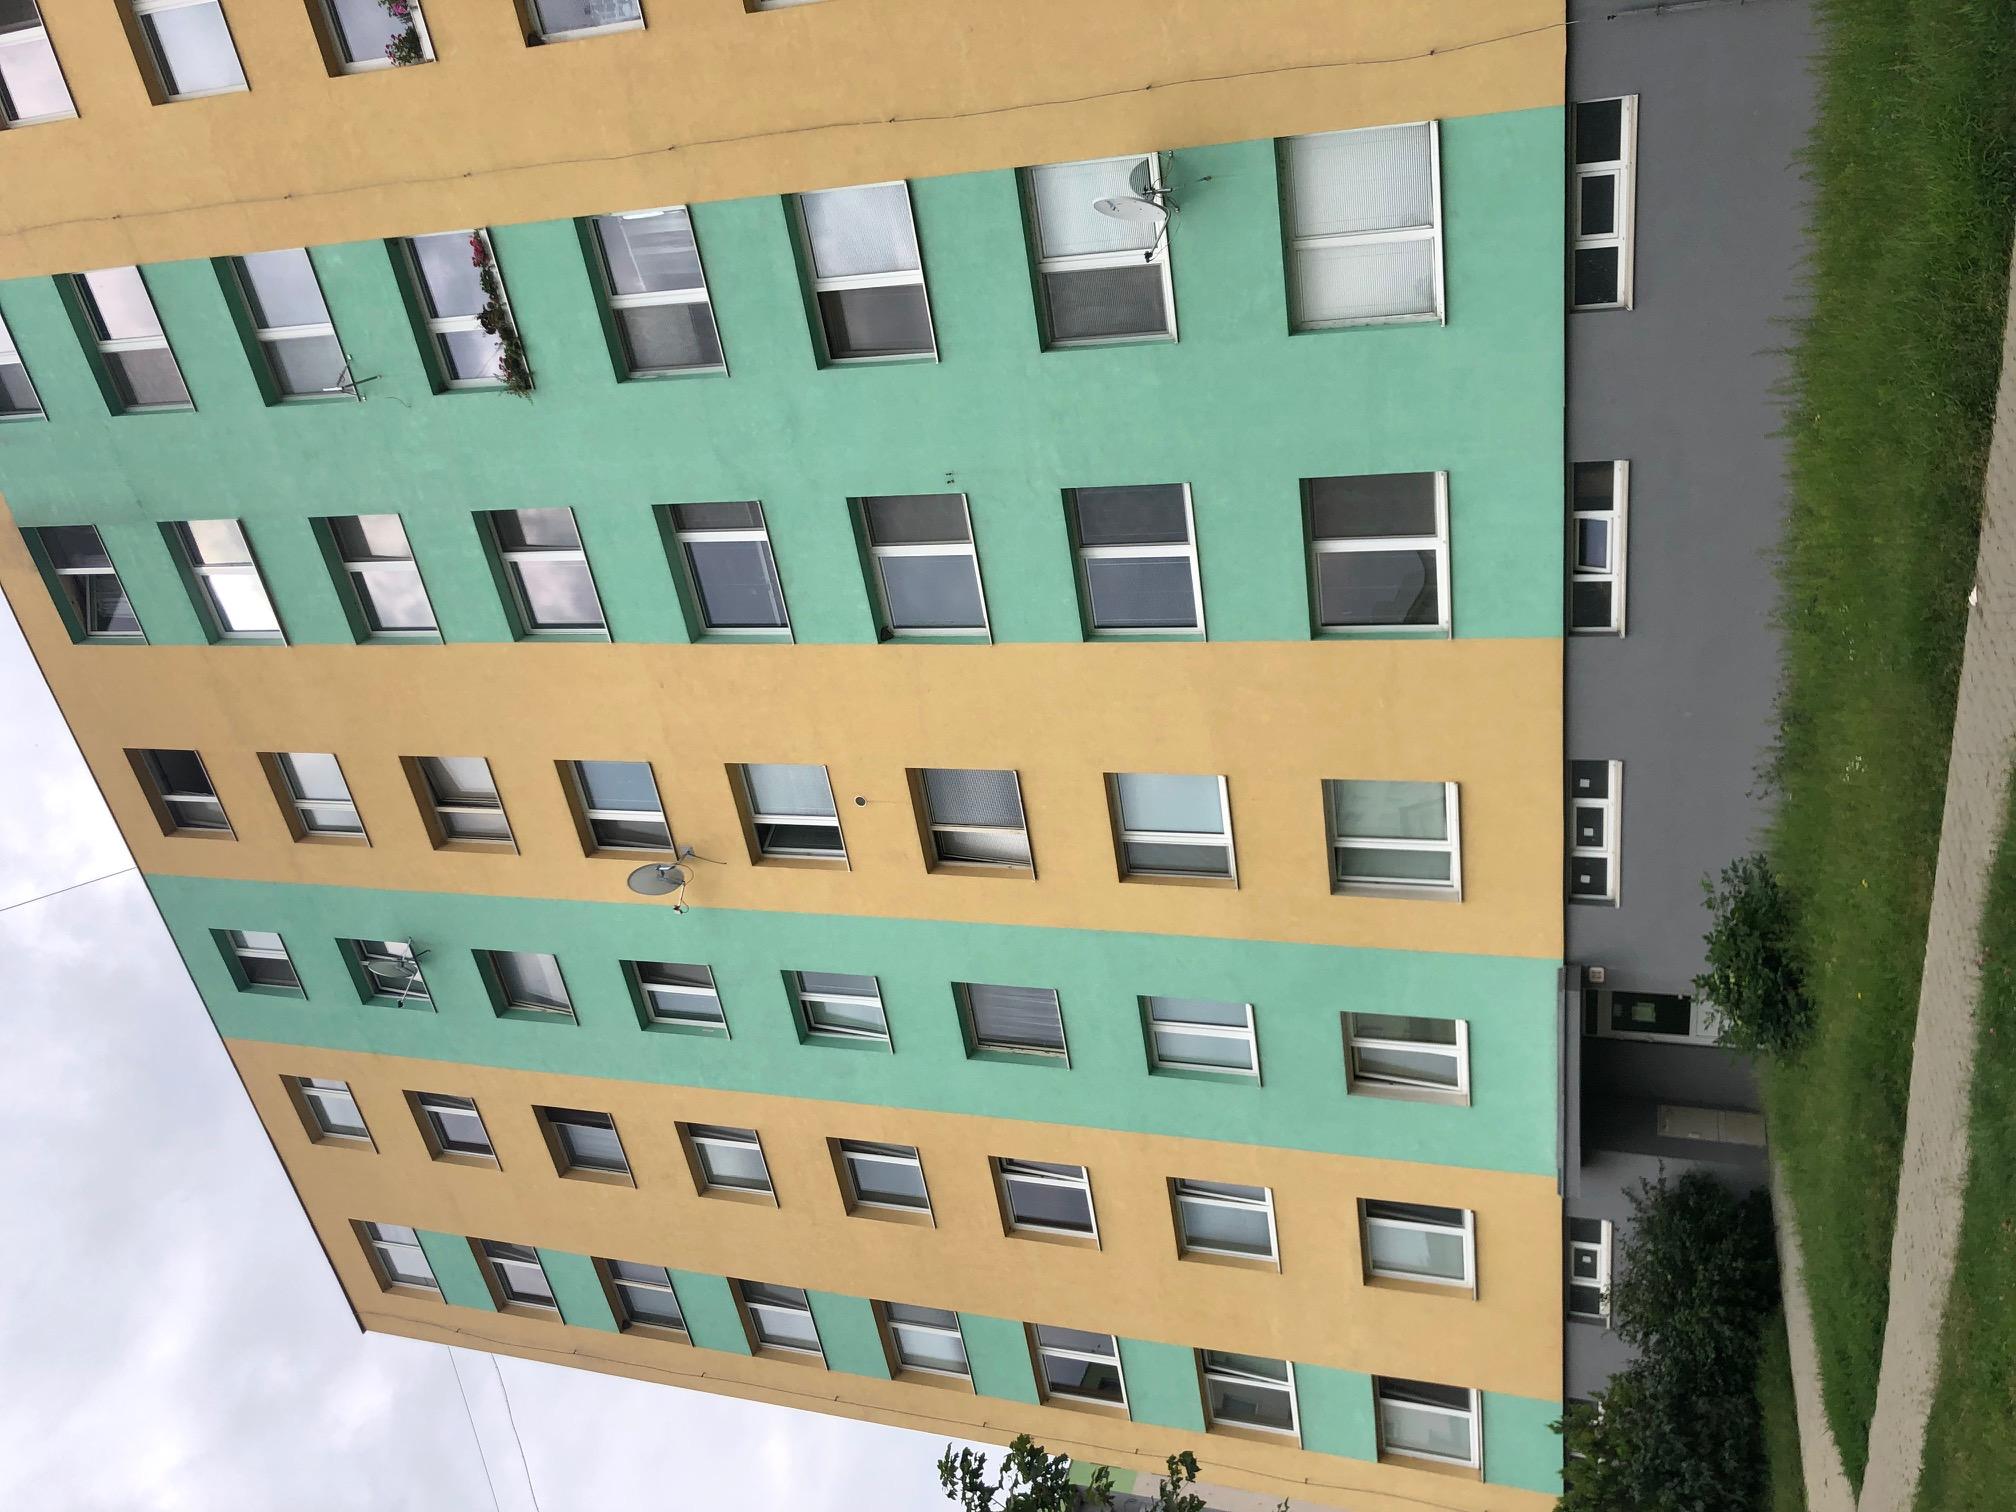 2 izbový byt, 52m2, pivnica, pôvodný stav, Skuteckého, Malacky Juh-26